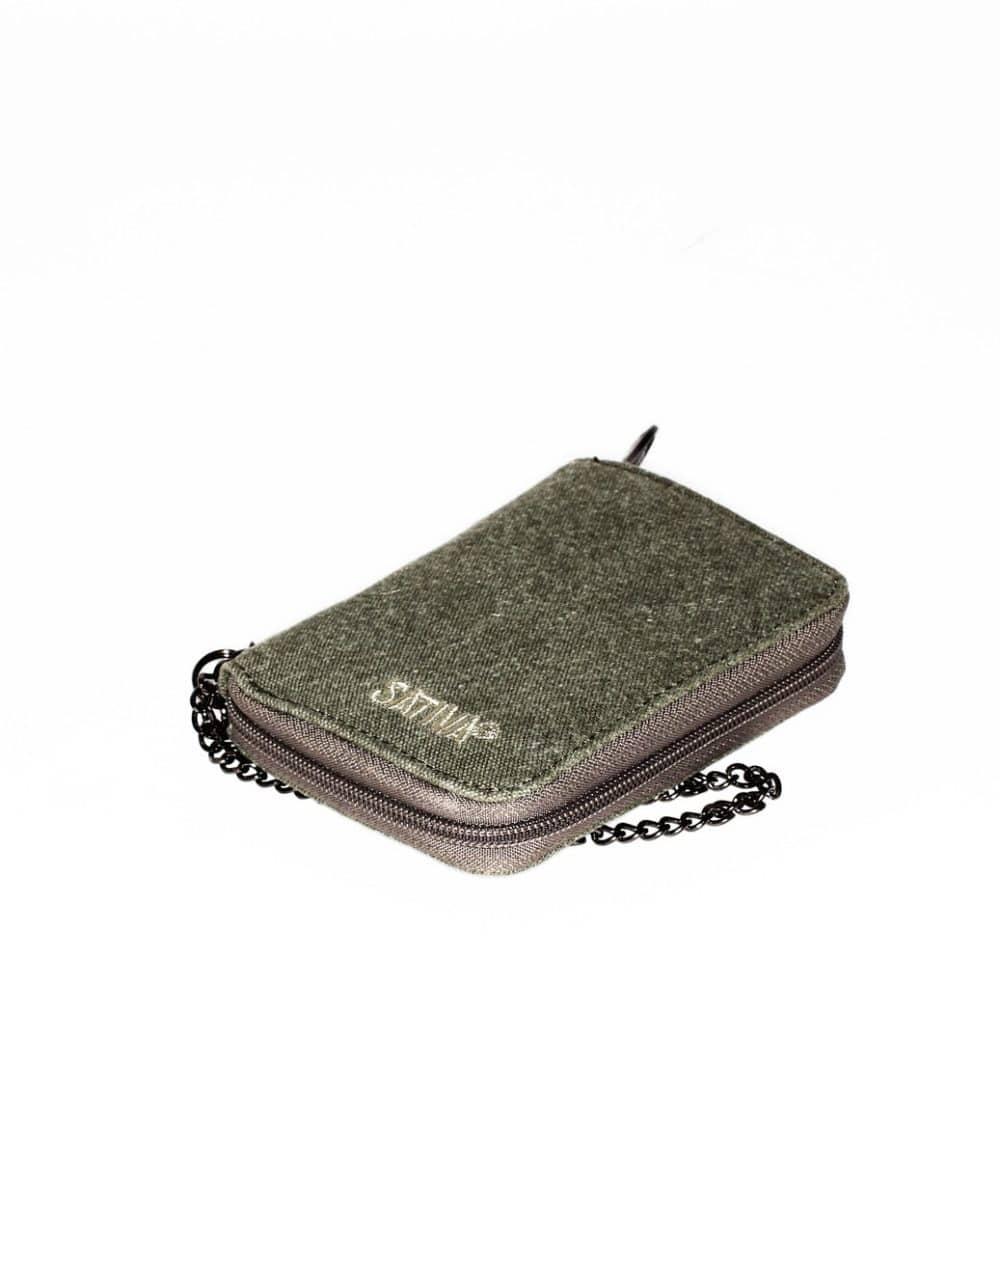 Hemp Wallet with Chain